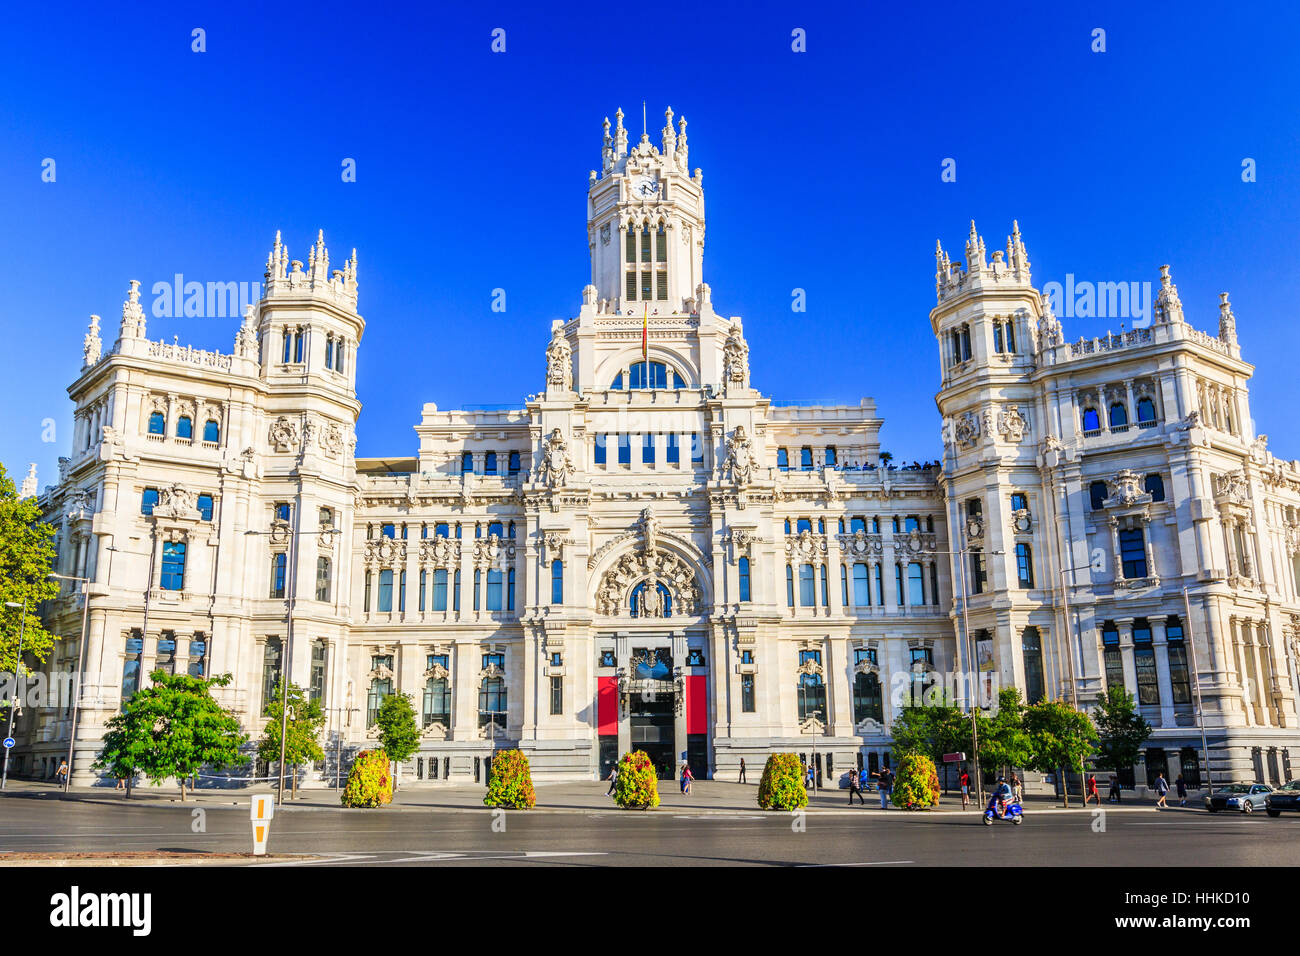 Madrid, Spain. Communications Palace (City Hall) from Plaza de Cibeles. - Stock Image